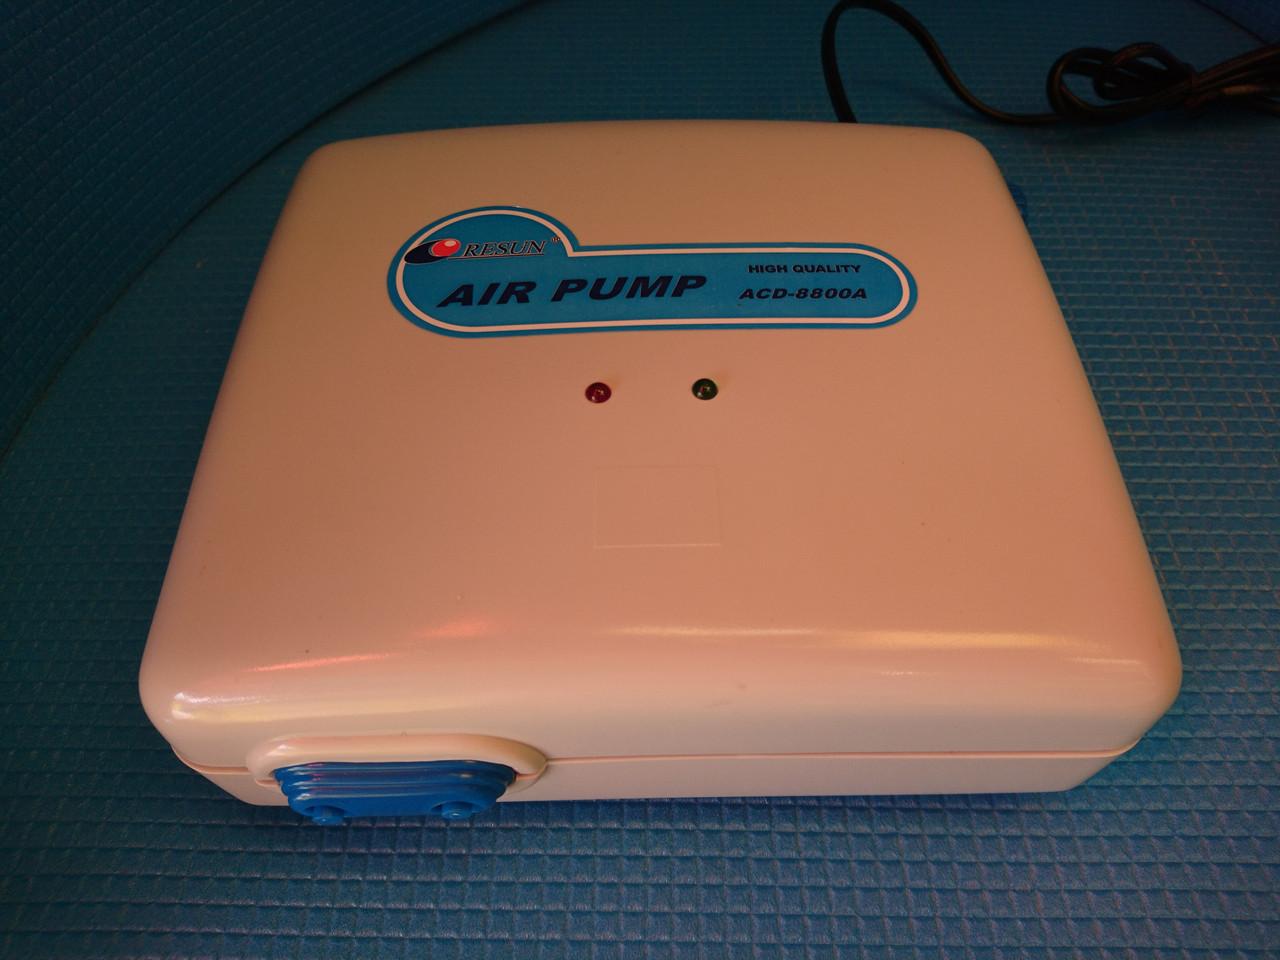 Компрессор на аккумуляторе Resun ACD 8800A, 5л/мин, 10W